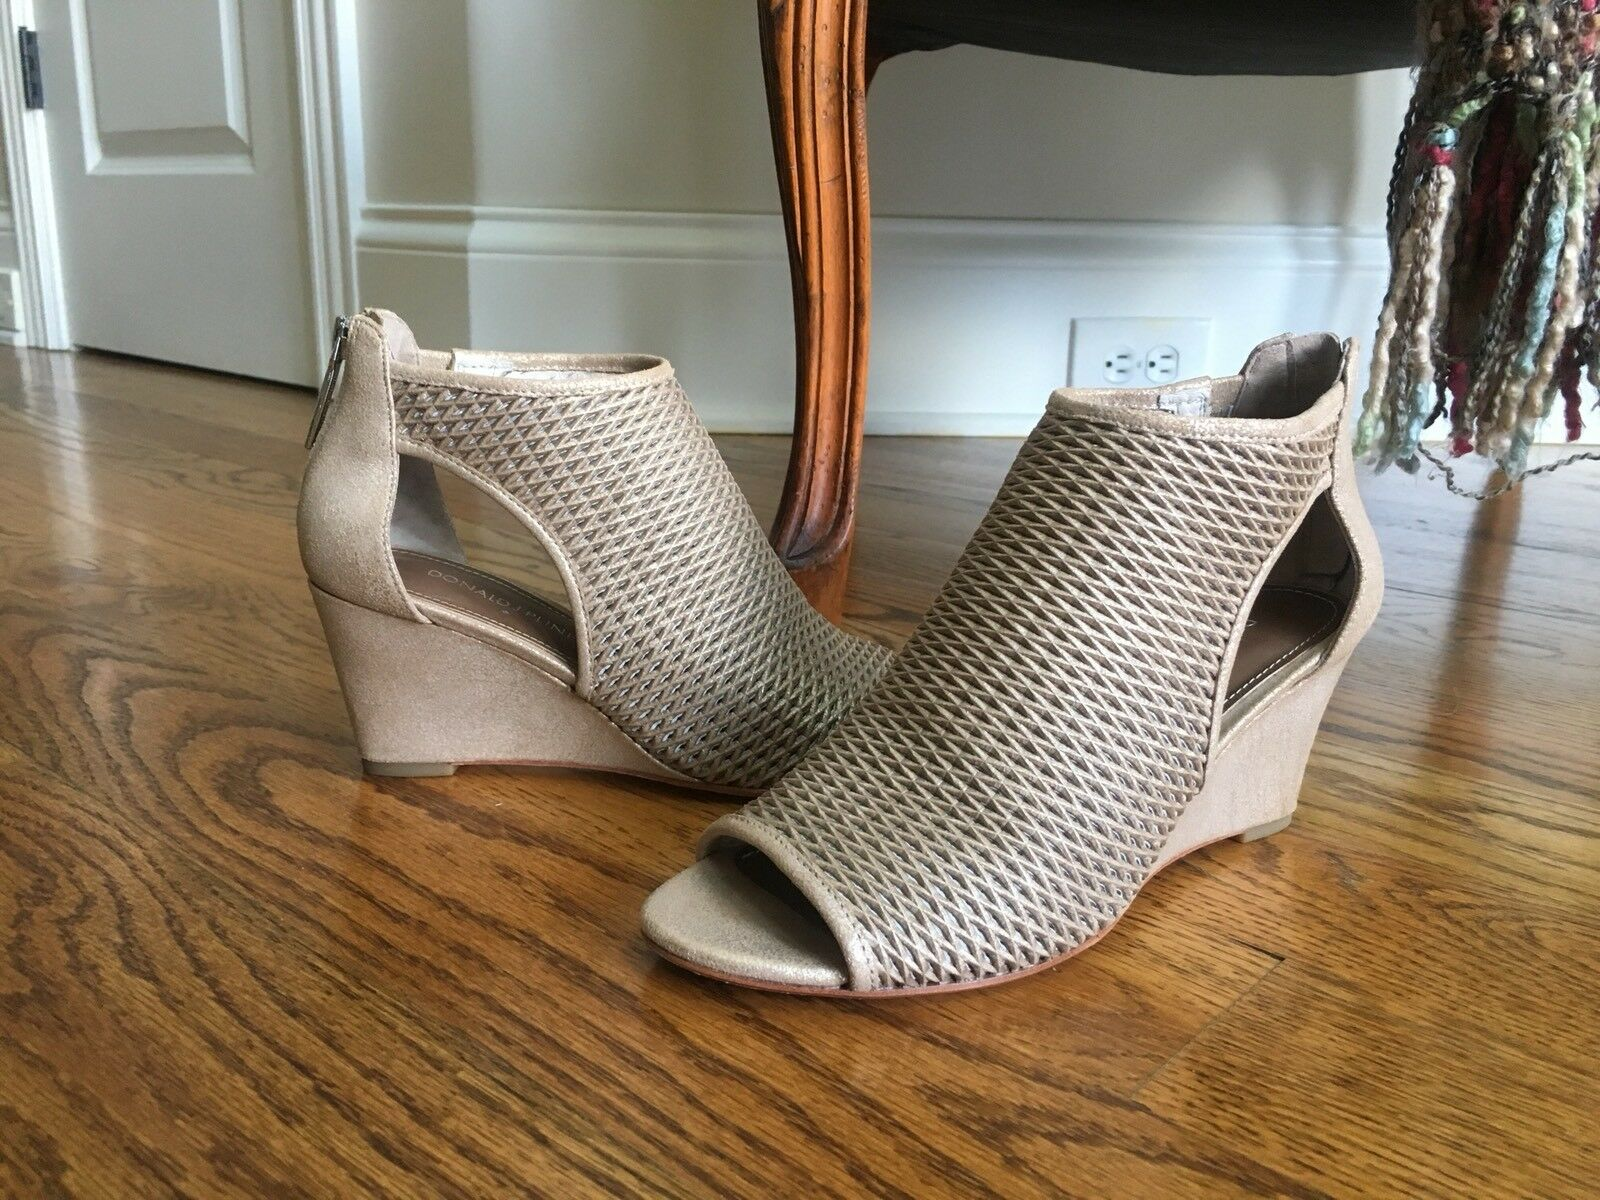 Donald J J J Pliner Womens Jace-T8T8 Wedge Sandal, Beige, 6-1 2 M 81c4f5